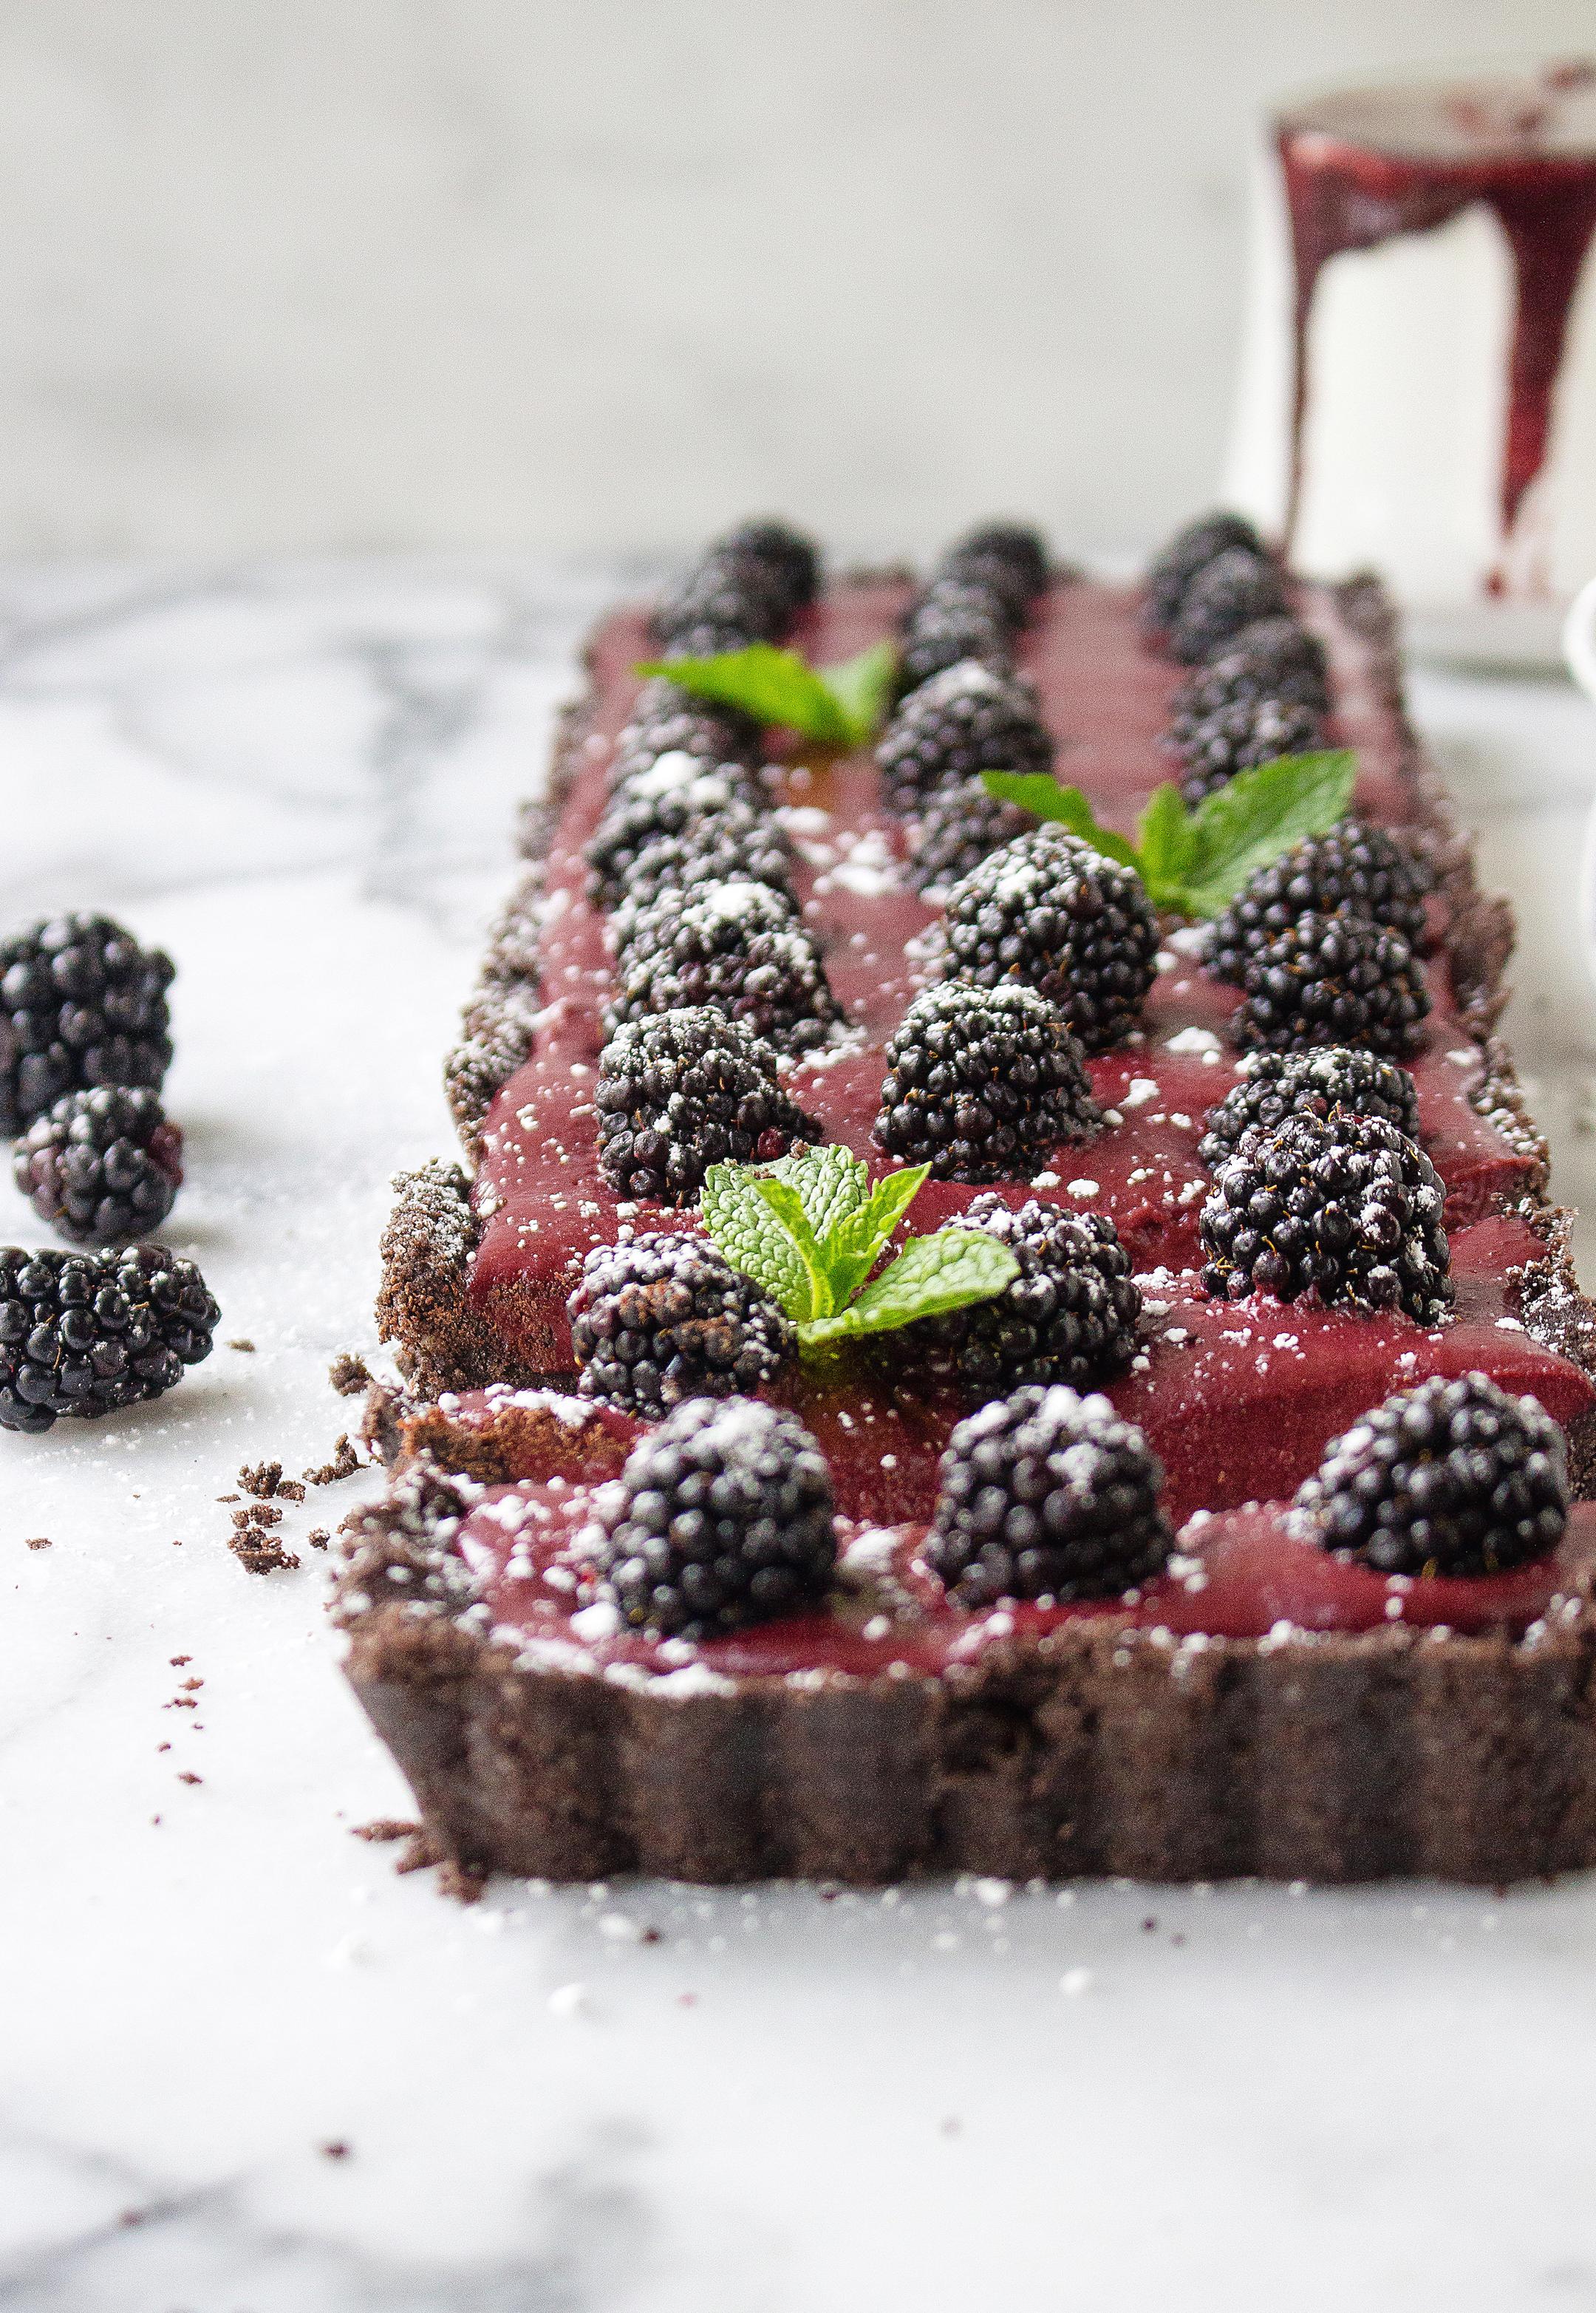 No-Bake Chocolate Blackberry Tart (with an Oreo crust!)